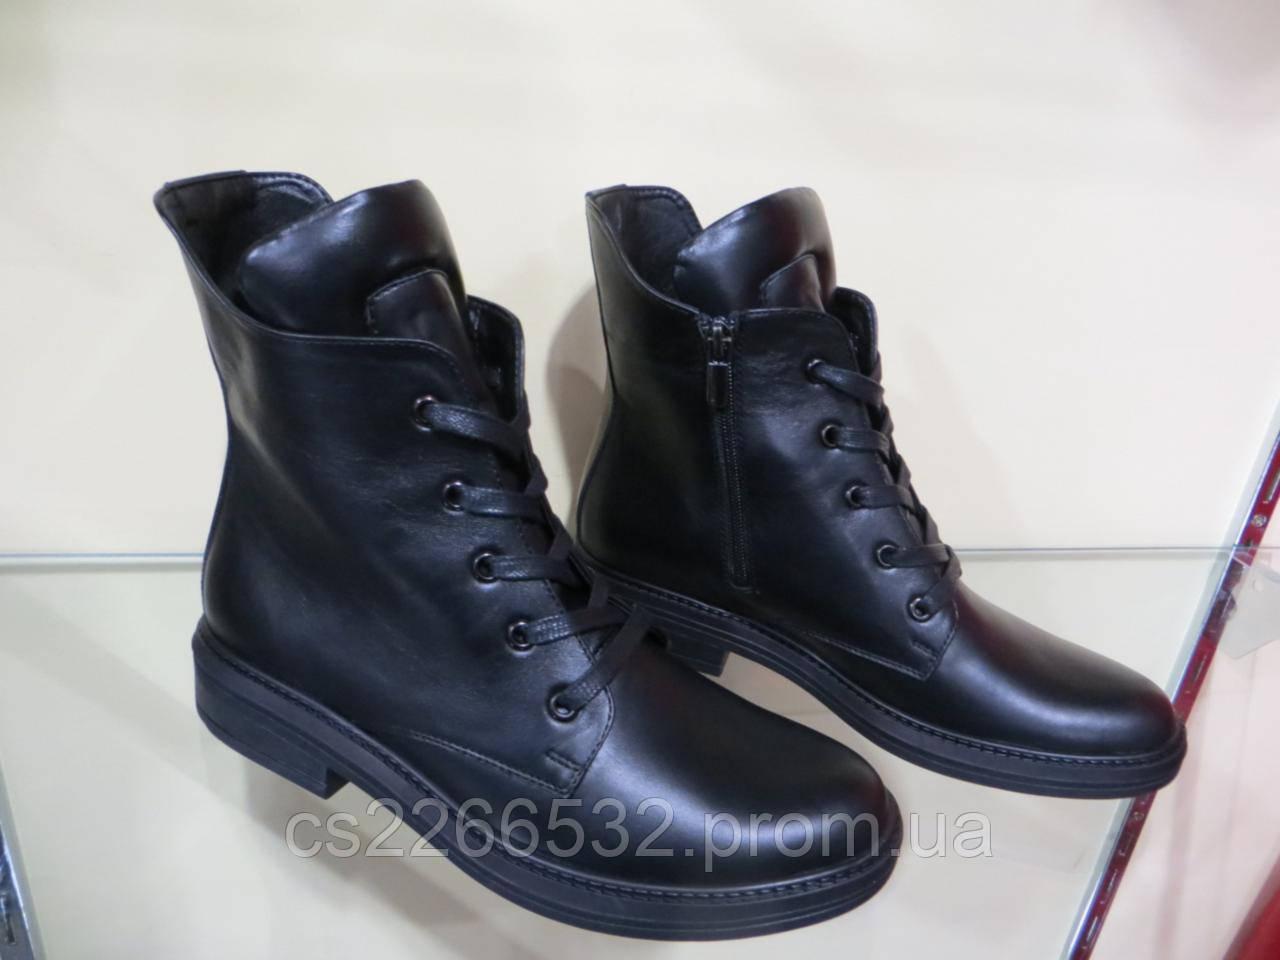 270a3706 Зимние ботинки на шнурках в коже, цена 1 400 грн., купить в Виннице ...